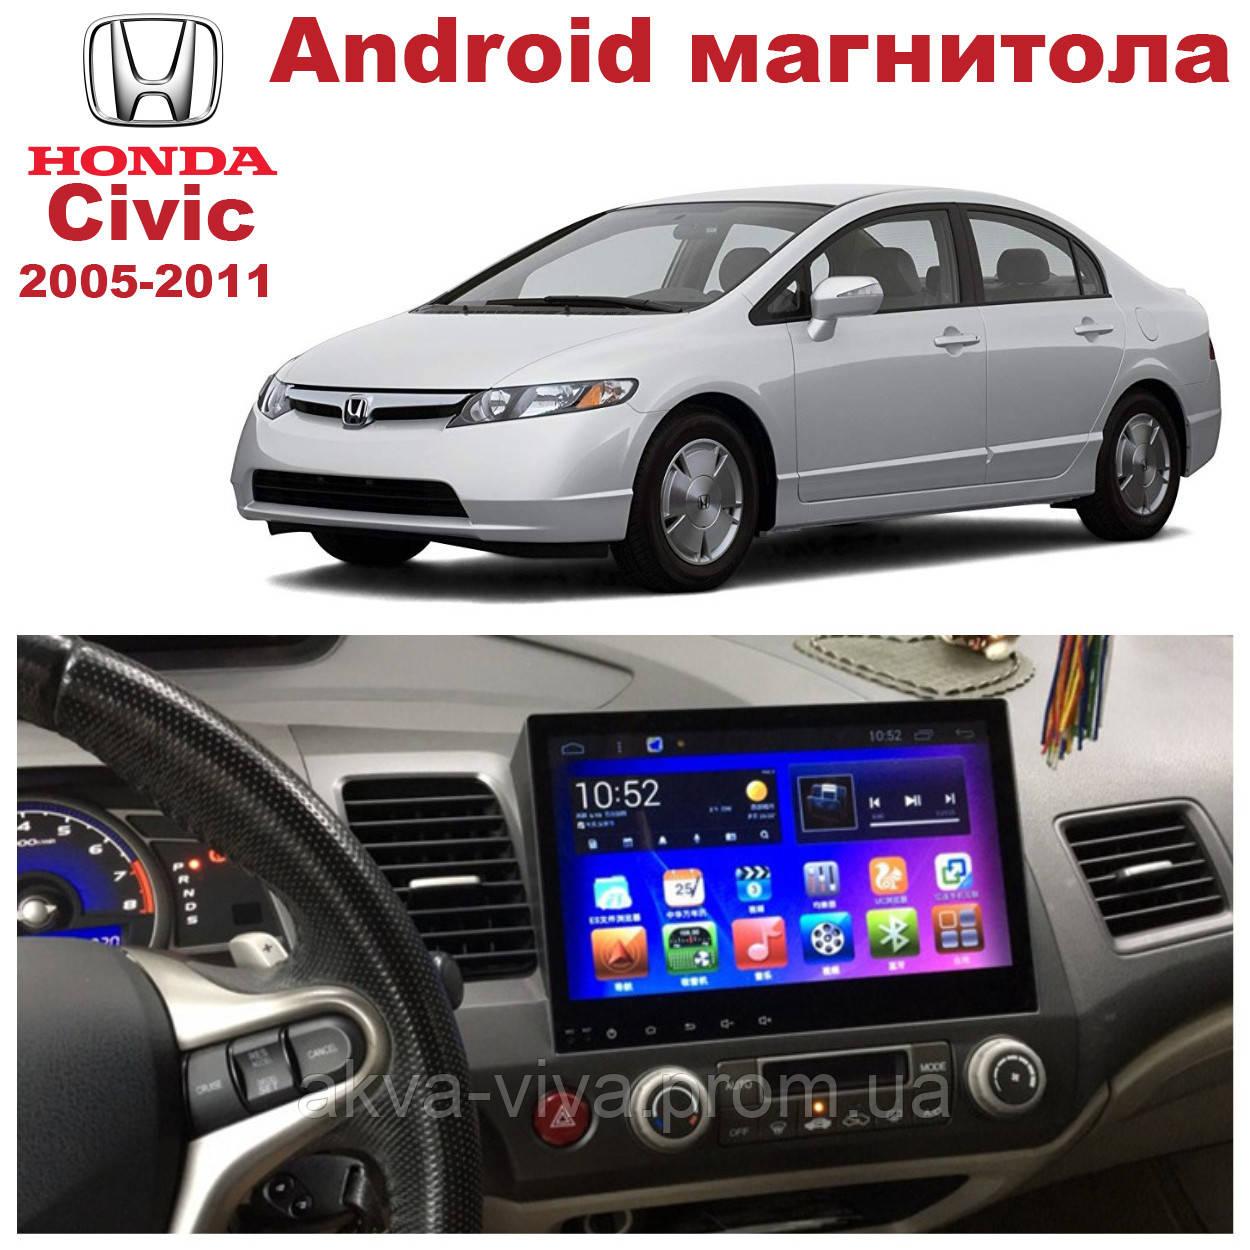 Штатная автомагнитола для Honda Civic 2005-2011 на ANDROID 8.1 (М-ХСв-10)